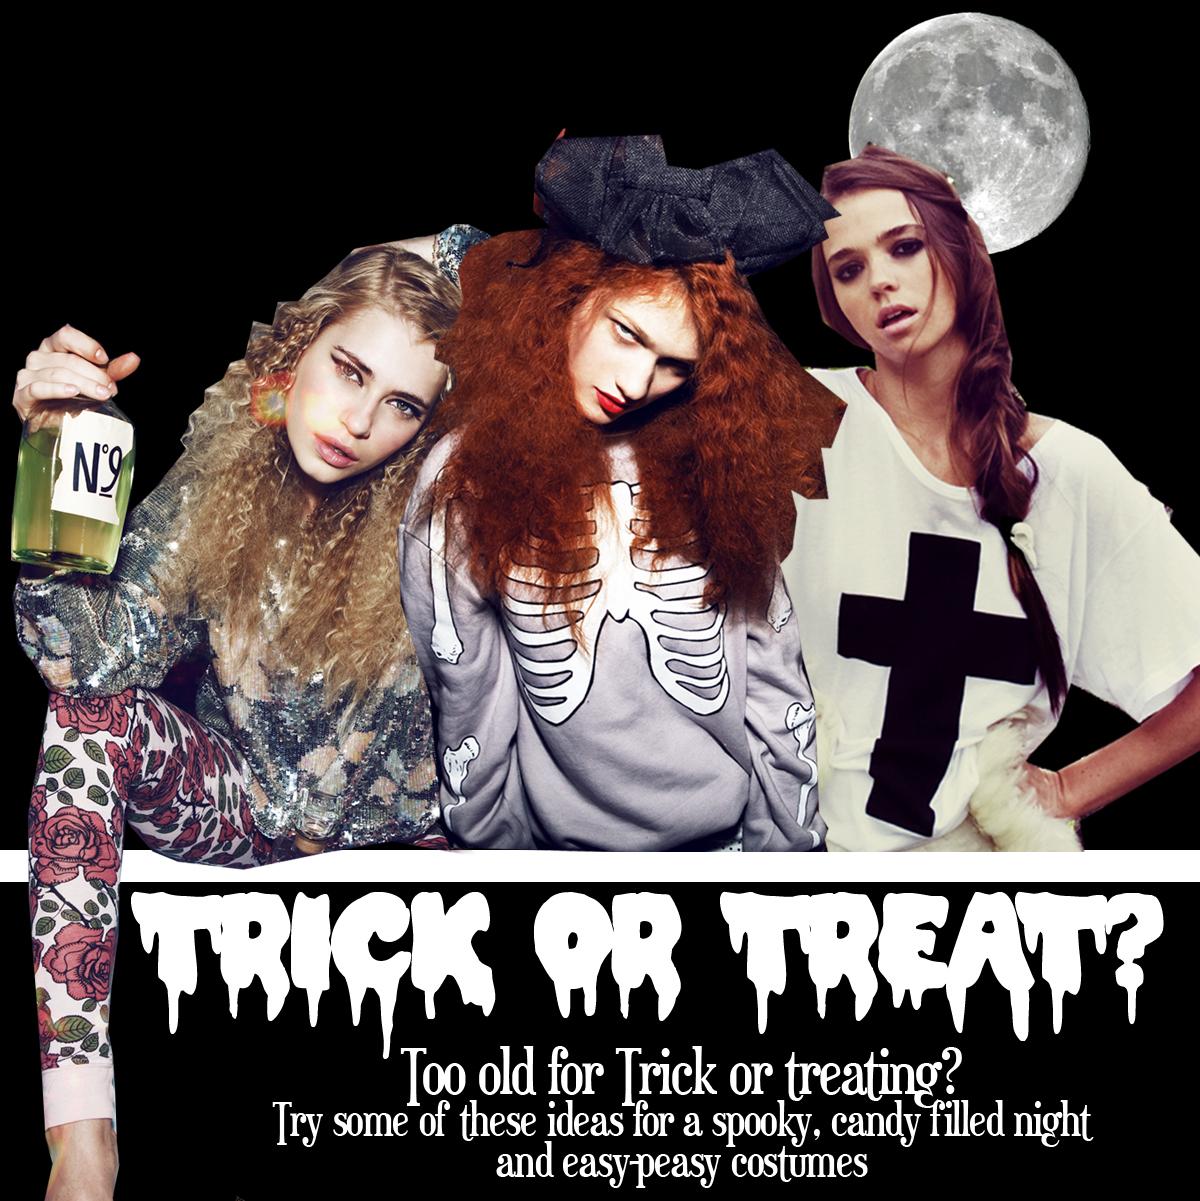 http://3.bp.blogspot.com/_Md3rg_kK3V4/TMxlpqcbVcI/AAAAAAAABnI/JnxHltBX3uA/s1600/to+do+halloween+wildfox.jpg